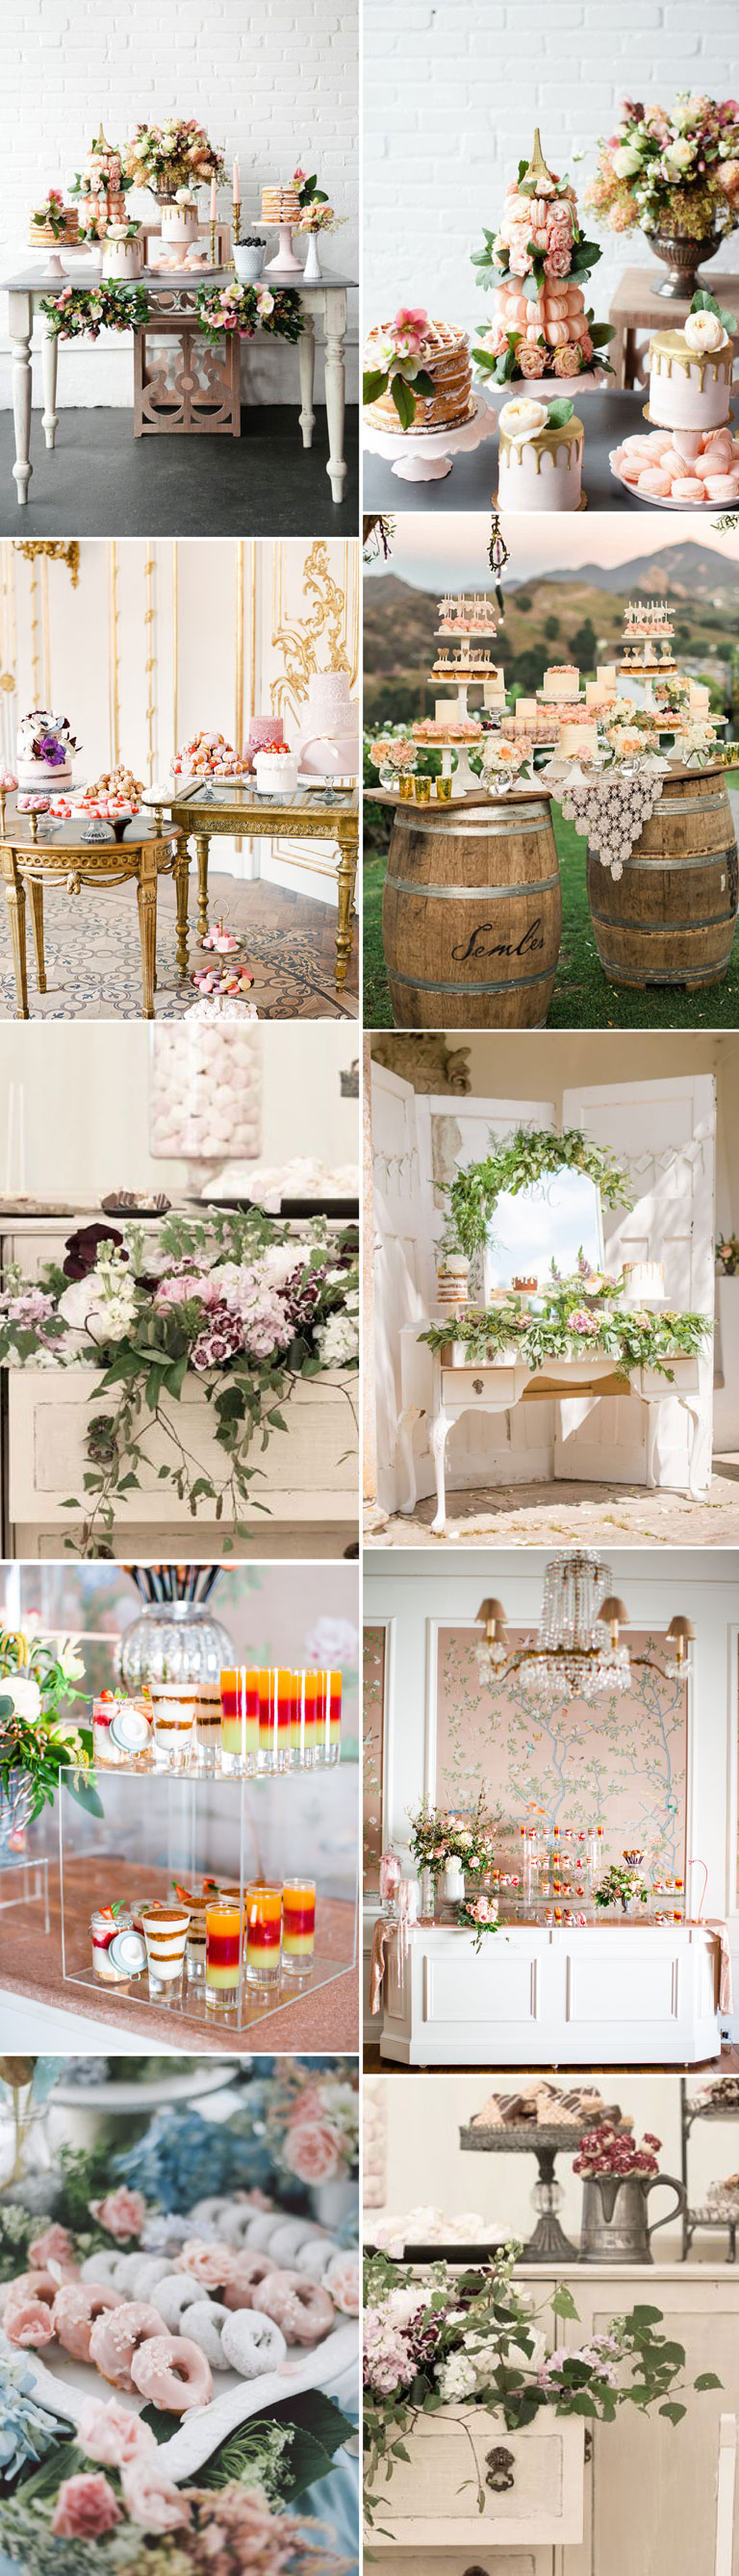 Wedding Dessert Table With A Pastel Colour Palette